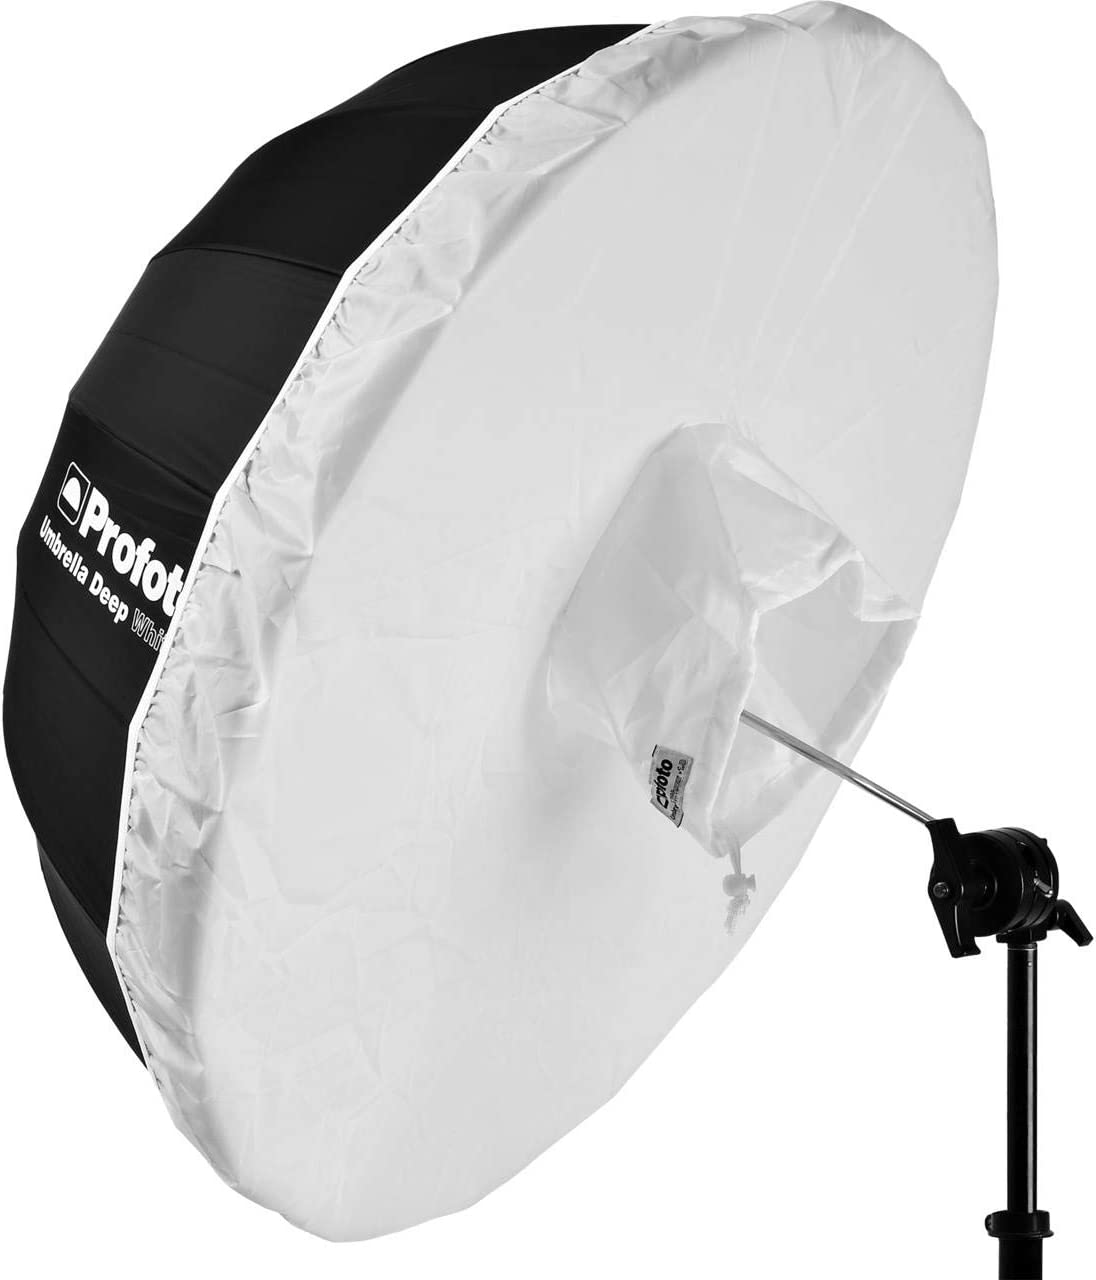 Profoto Umbrella Diffuser (Medium) 61JoJJg12BhLSL1280_